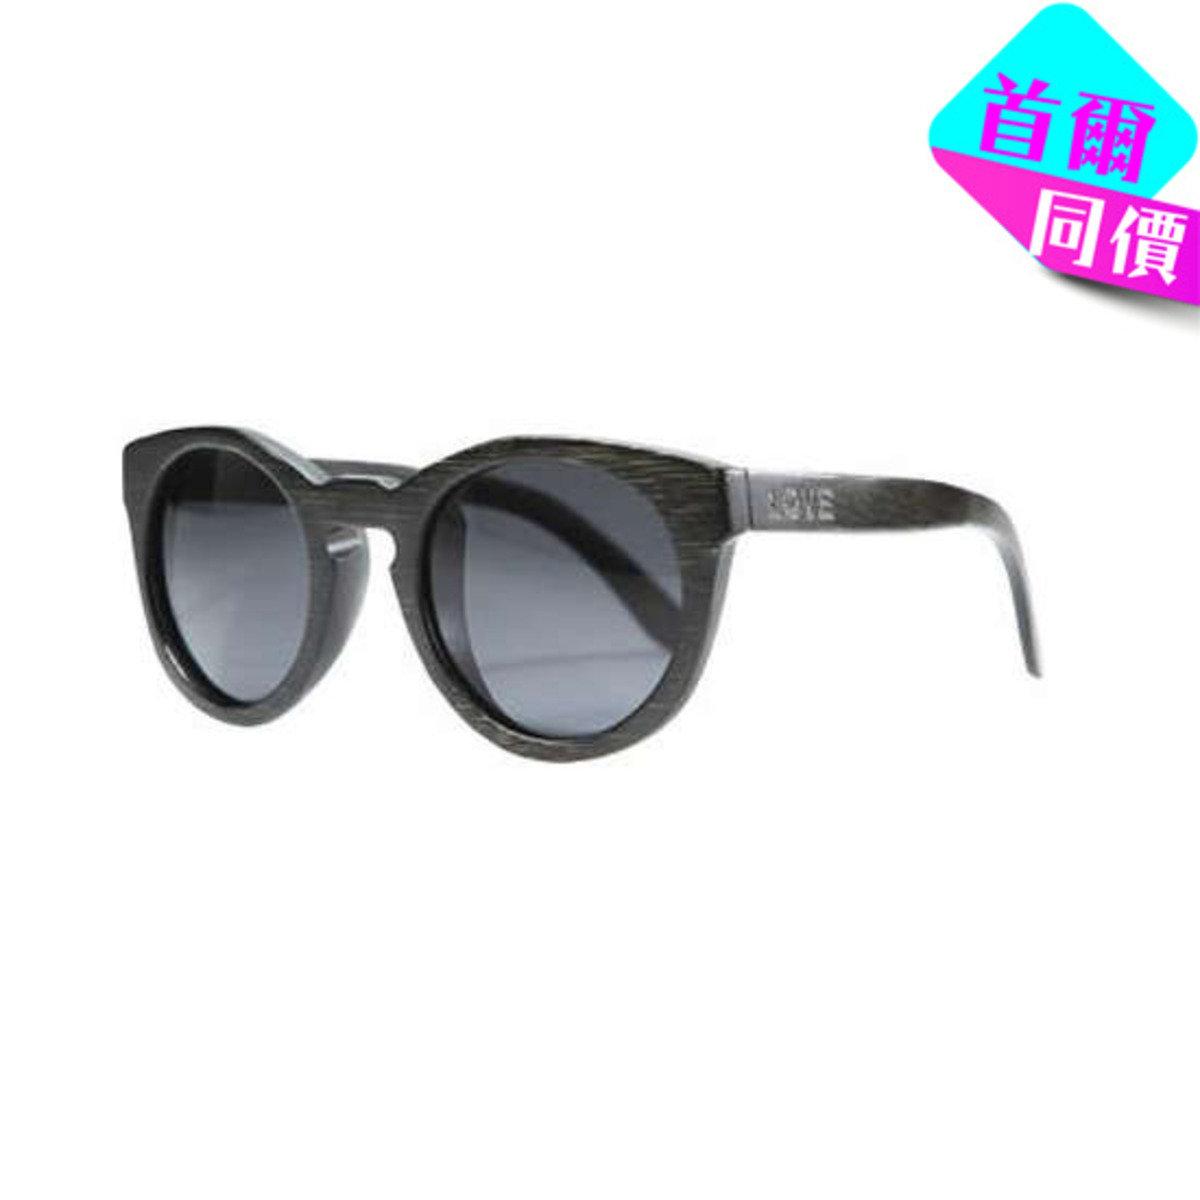 LACE -  黑色竹製框架太陽眼鏡